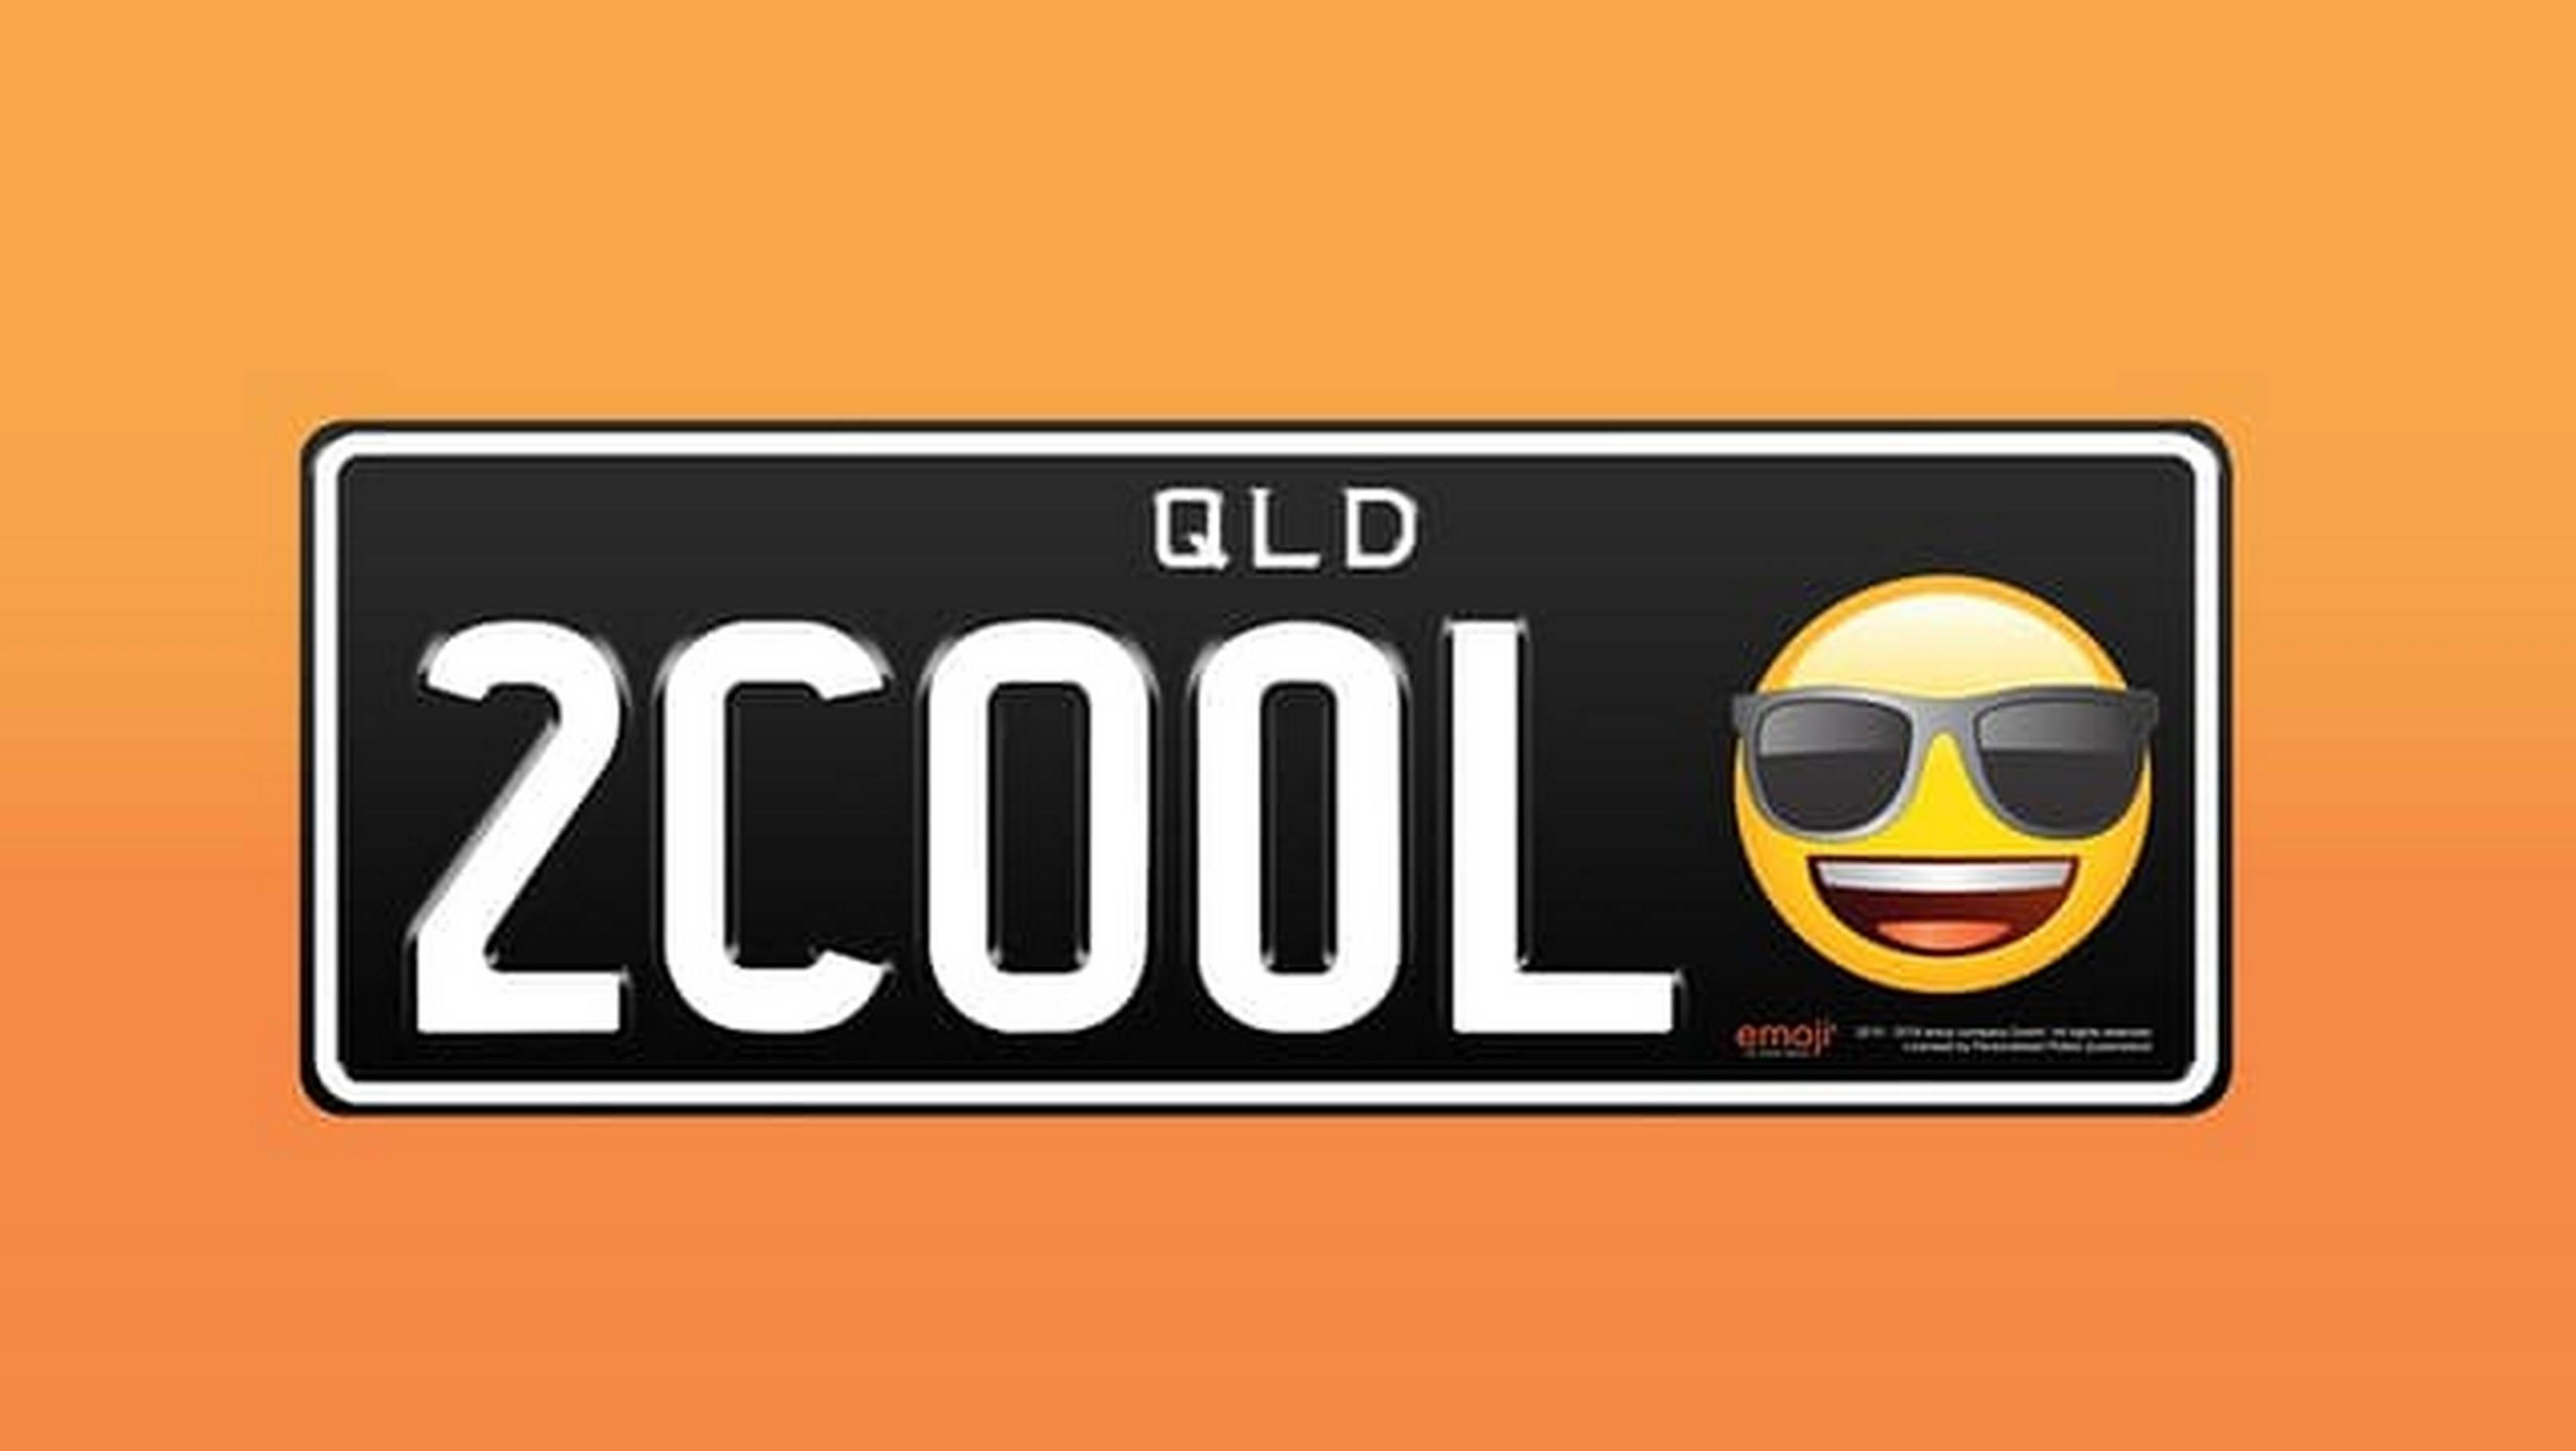 Queensland Australia Launching Emoji License Plates – WHEELS ca